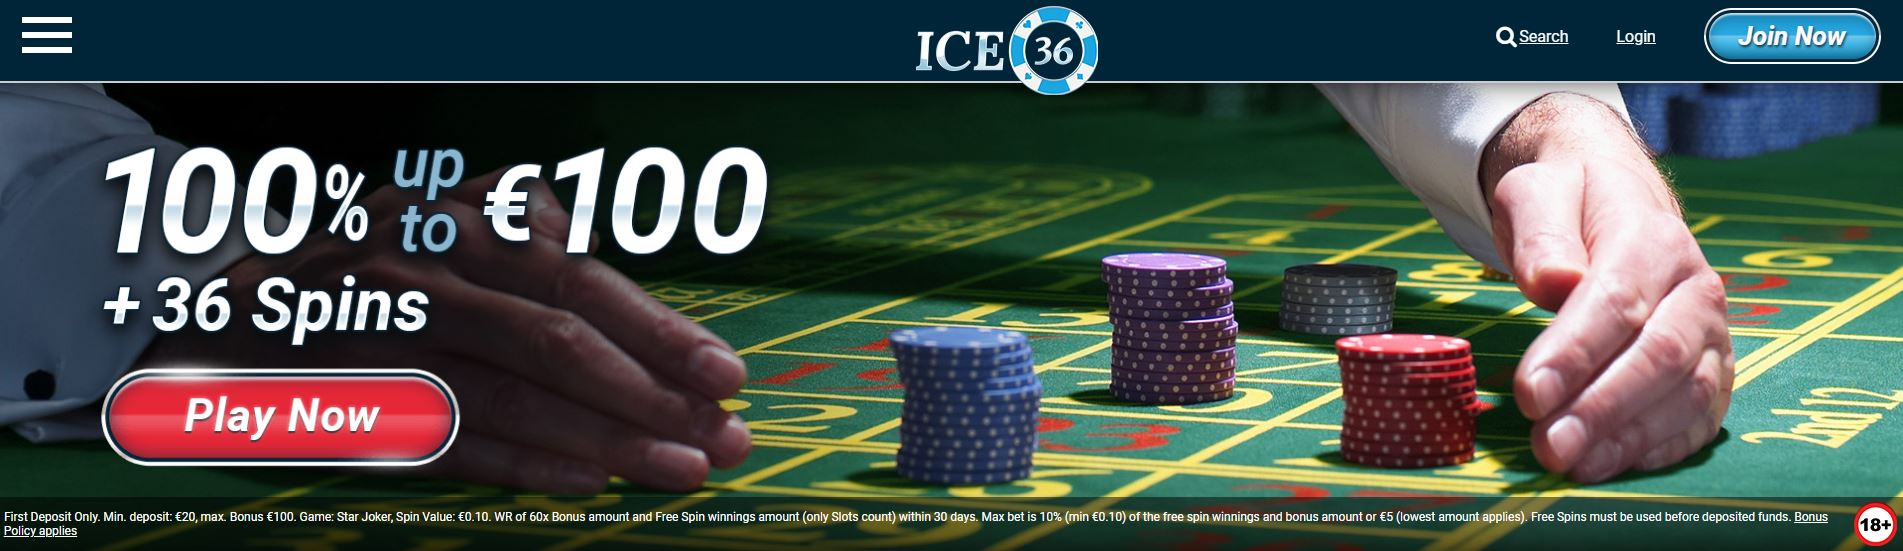 ice36 freespins